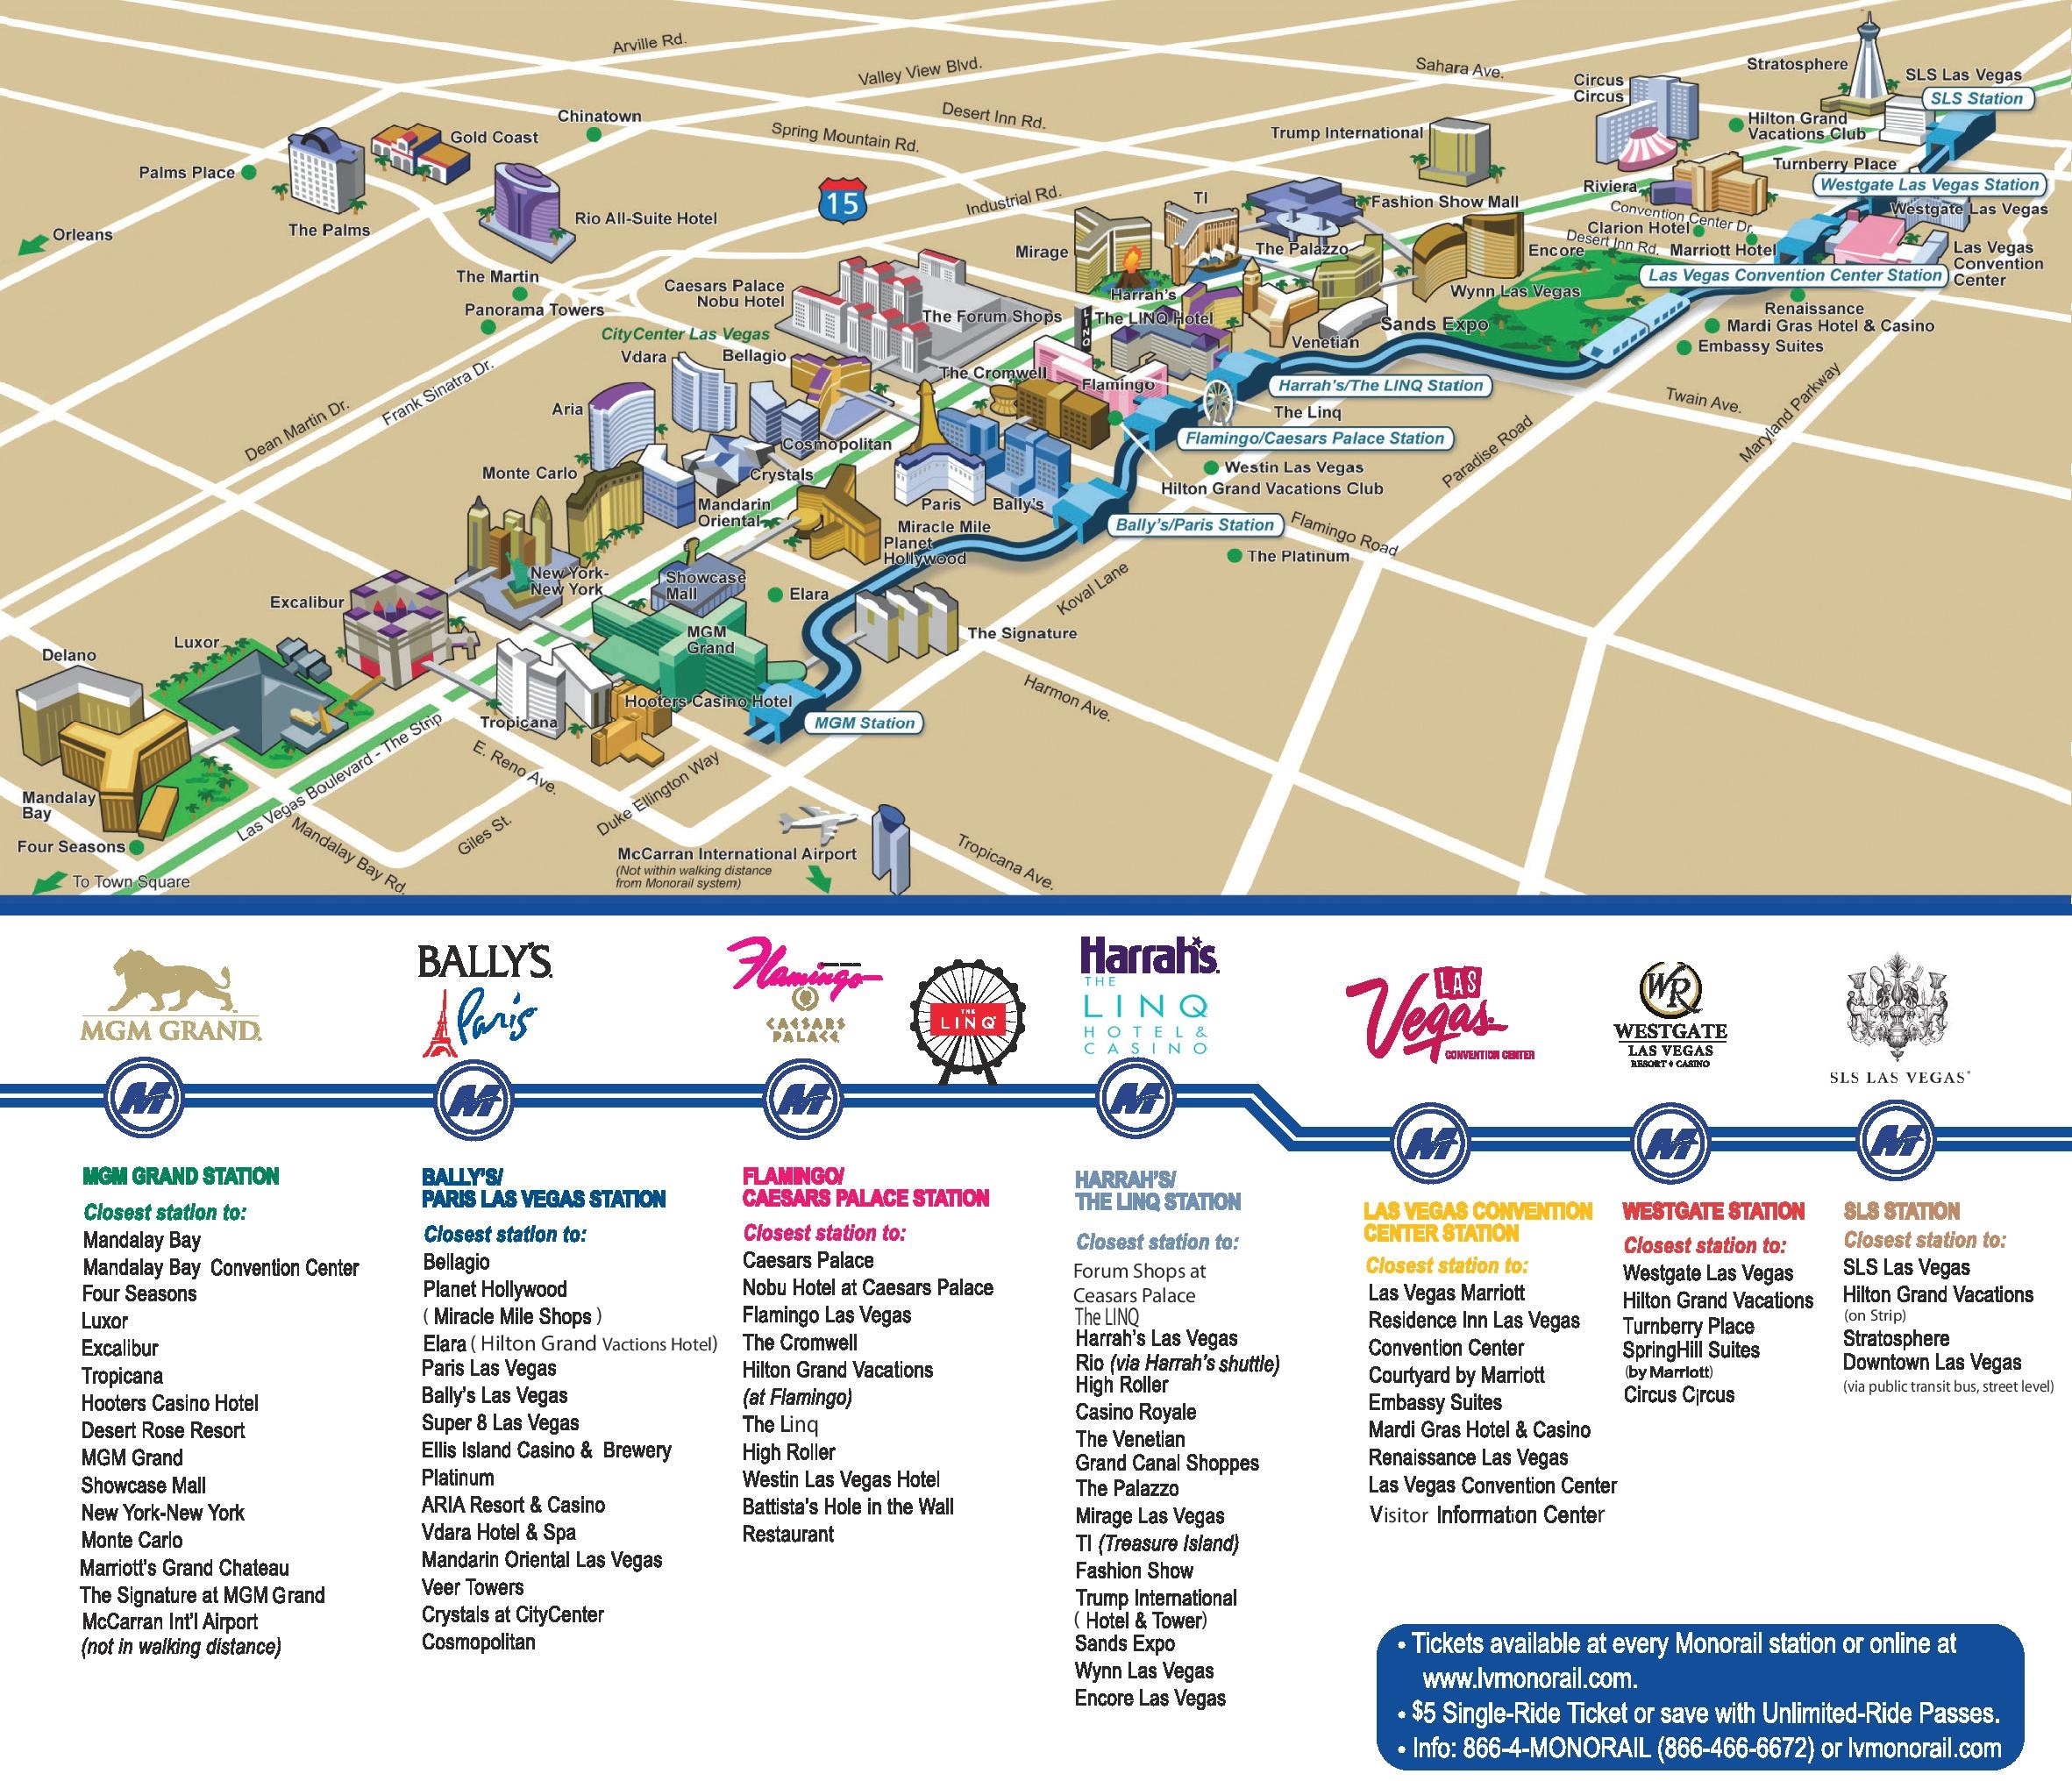 Las Vegas strip hotels 33030